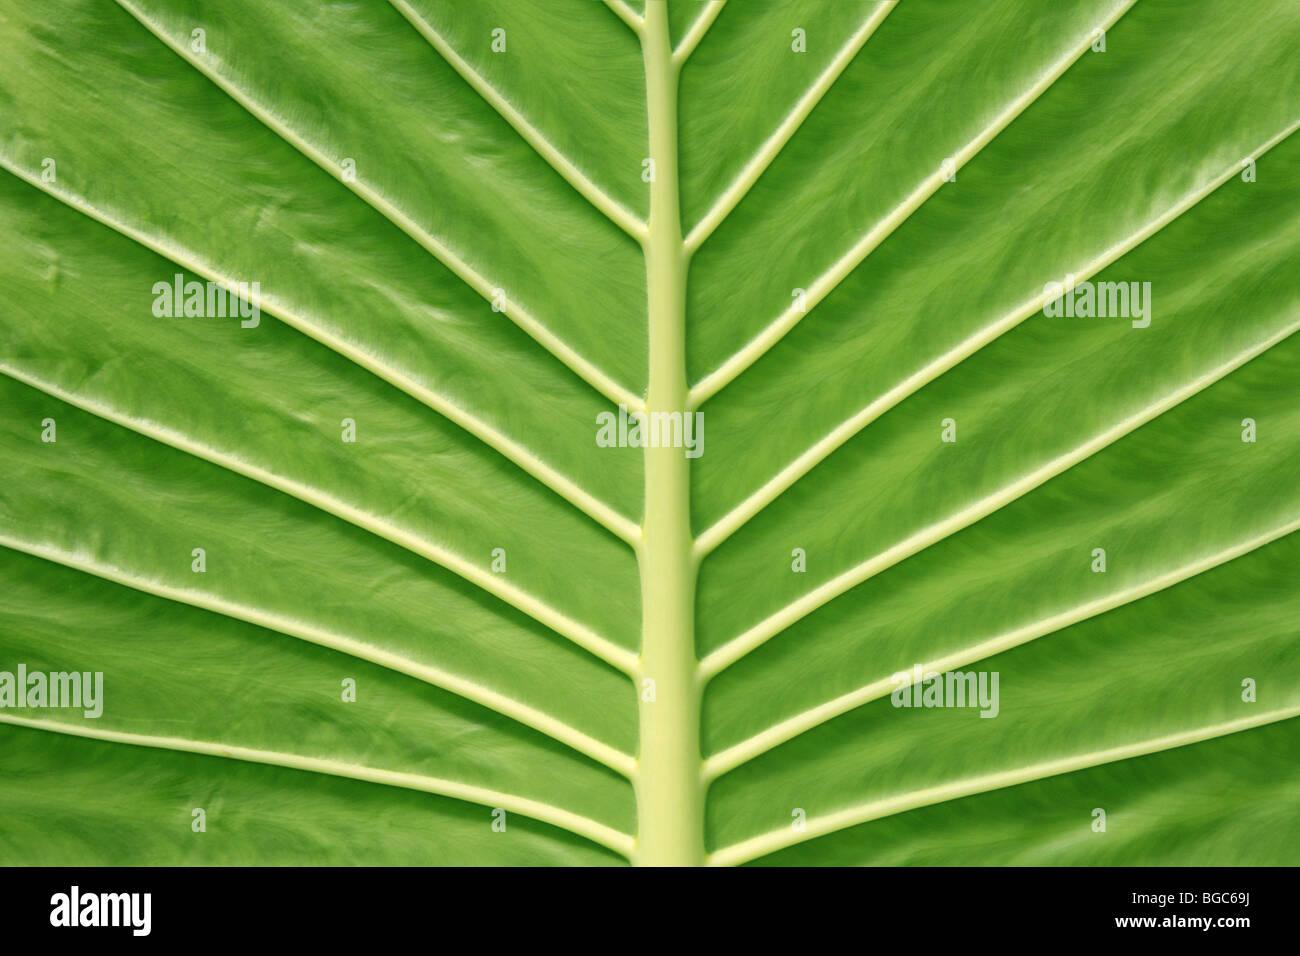 BIG 'Green Leaf' veins underside symmetry symmetrical perfect nature creation jungle, Giant Taro - Stock Image